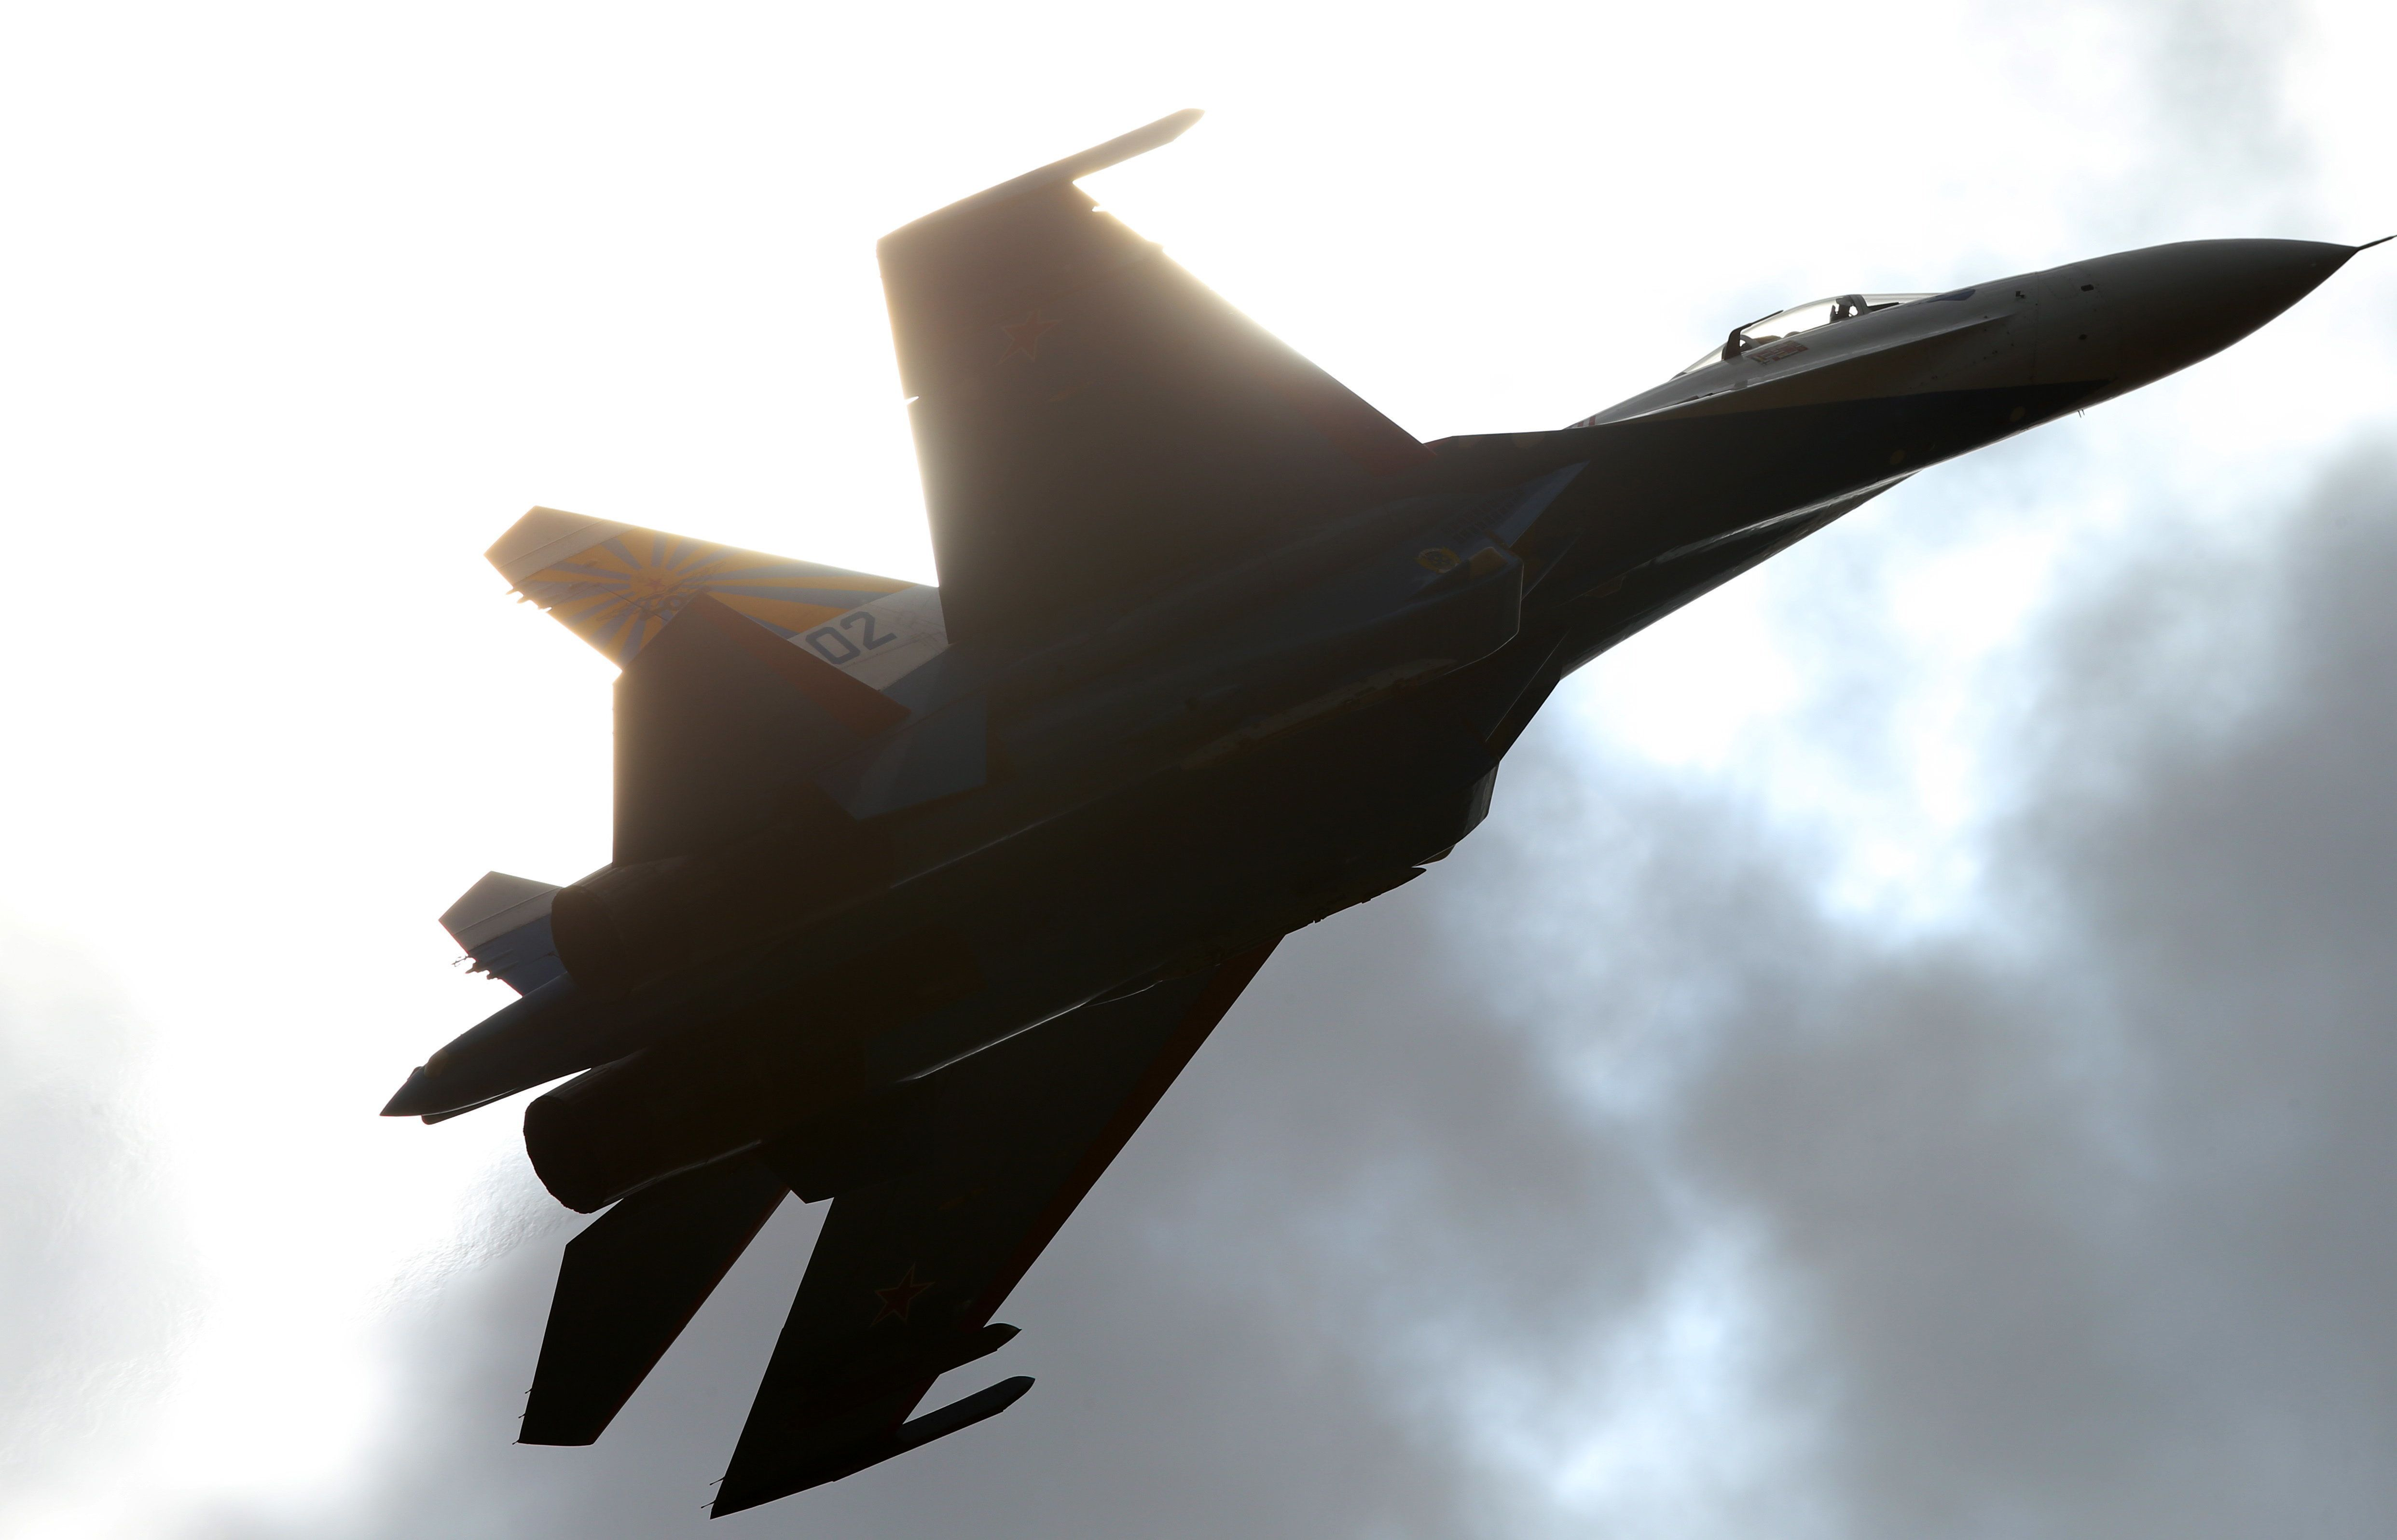 Nέα βίντεο από την αναχαίτιση αμερικανικού αεροπλάνου από ρωσικό μαχητικό στη Μαύρη